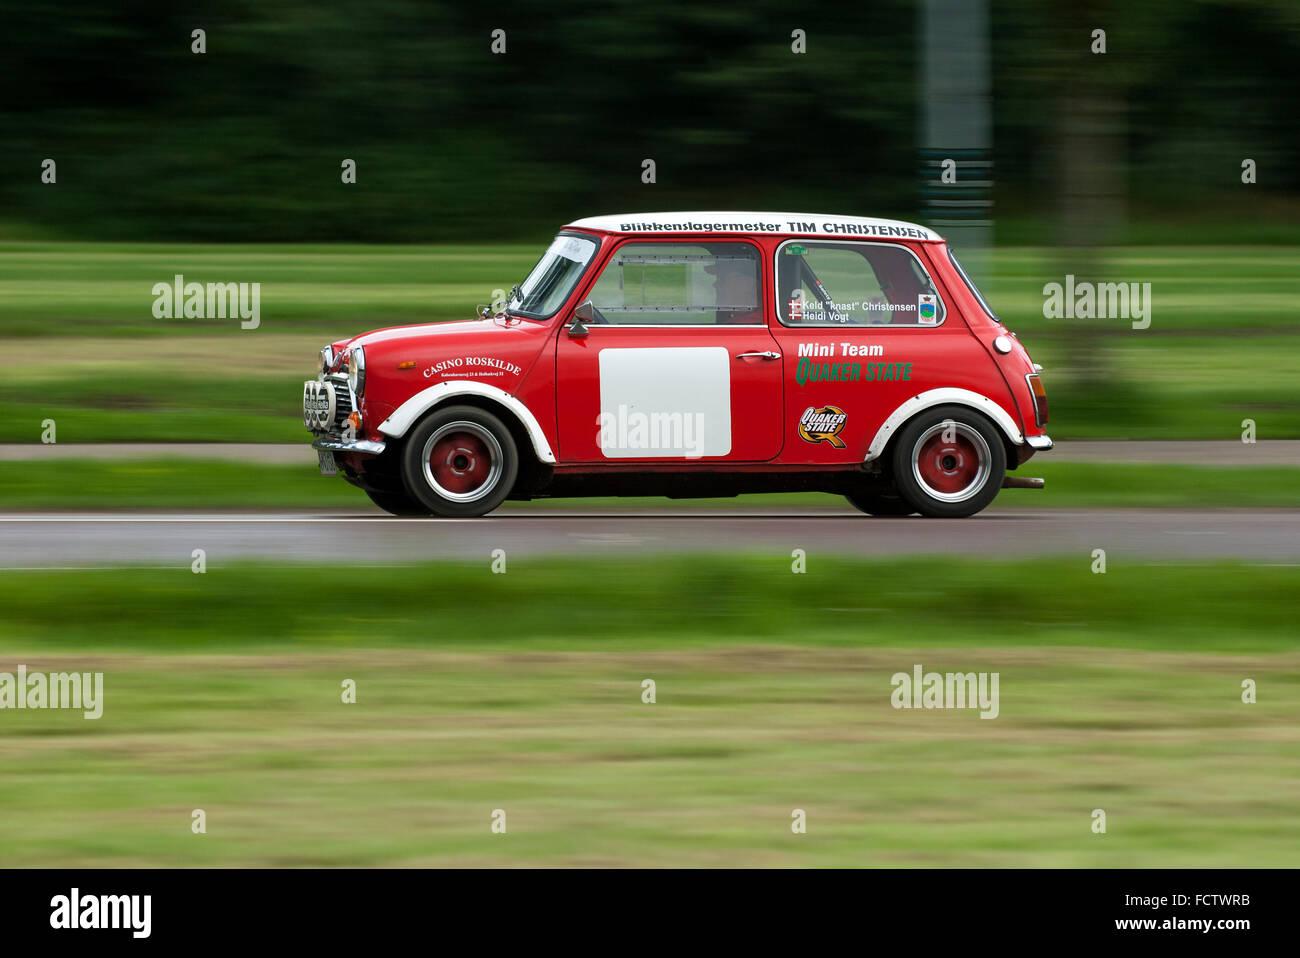 Classic Mini rally car Stock Photo: 93974815 - Alamy